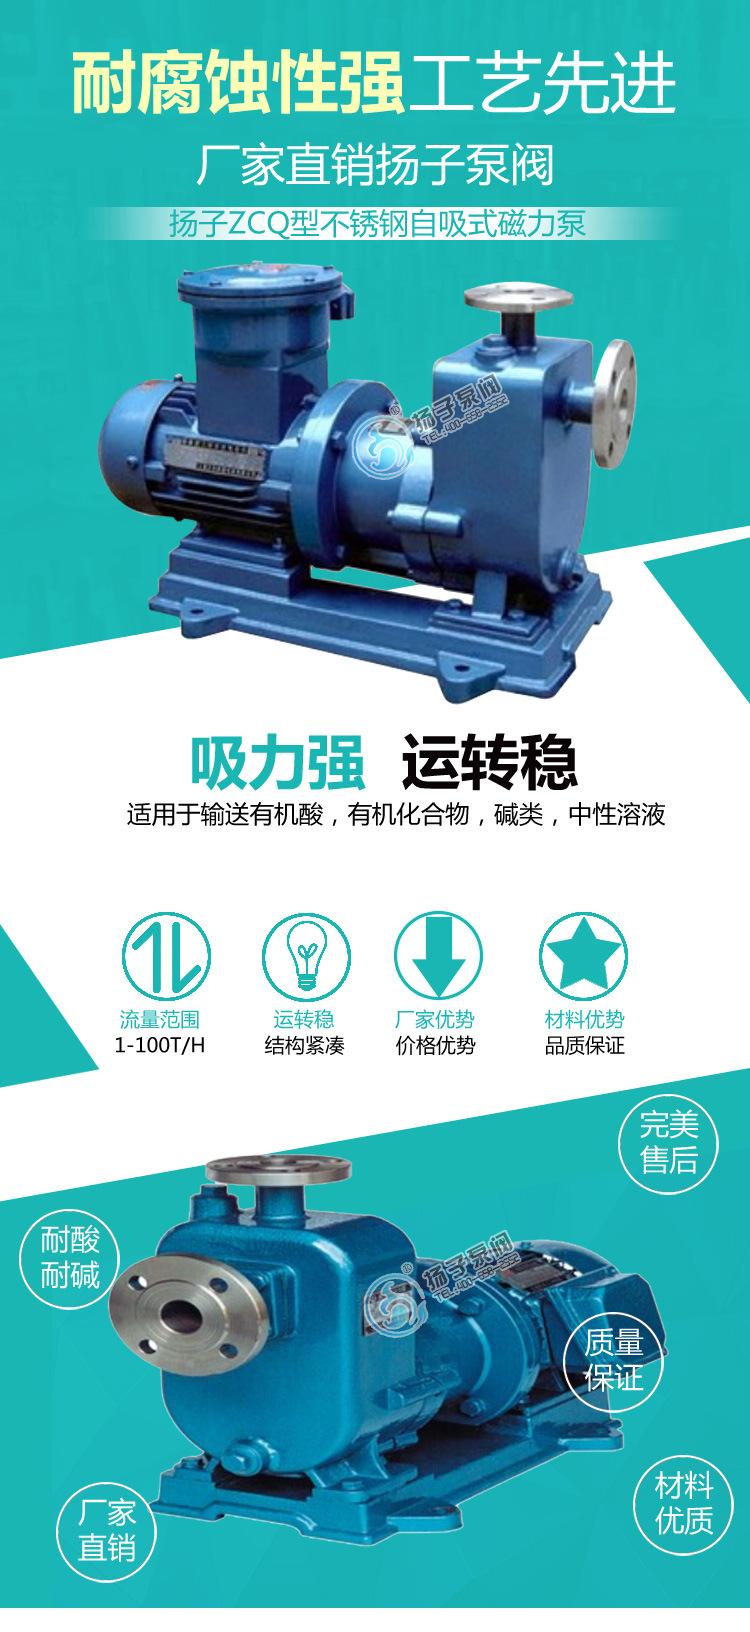 ZCQ25-20-115不锈钢自吸式泵力泵 卧式磁力驱动泵 无泄露磁力泵示例图1